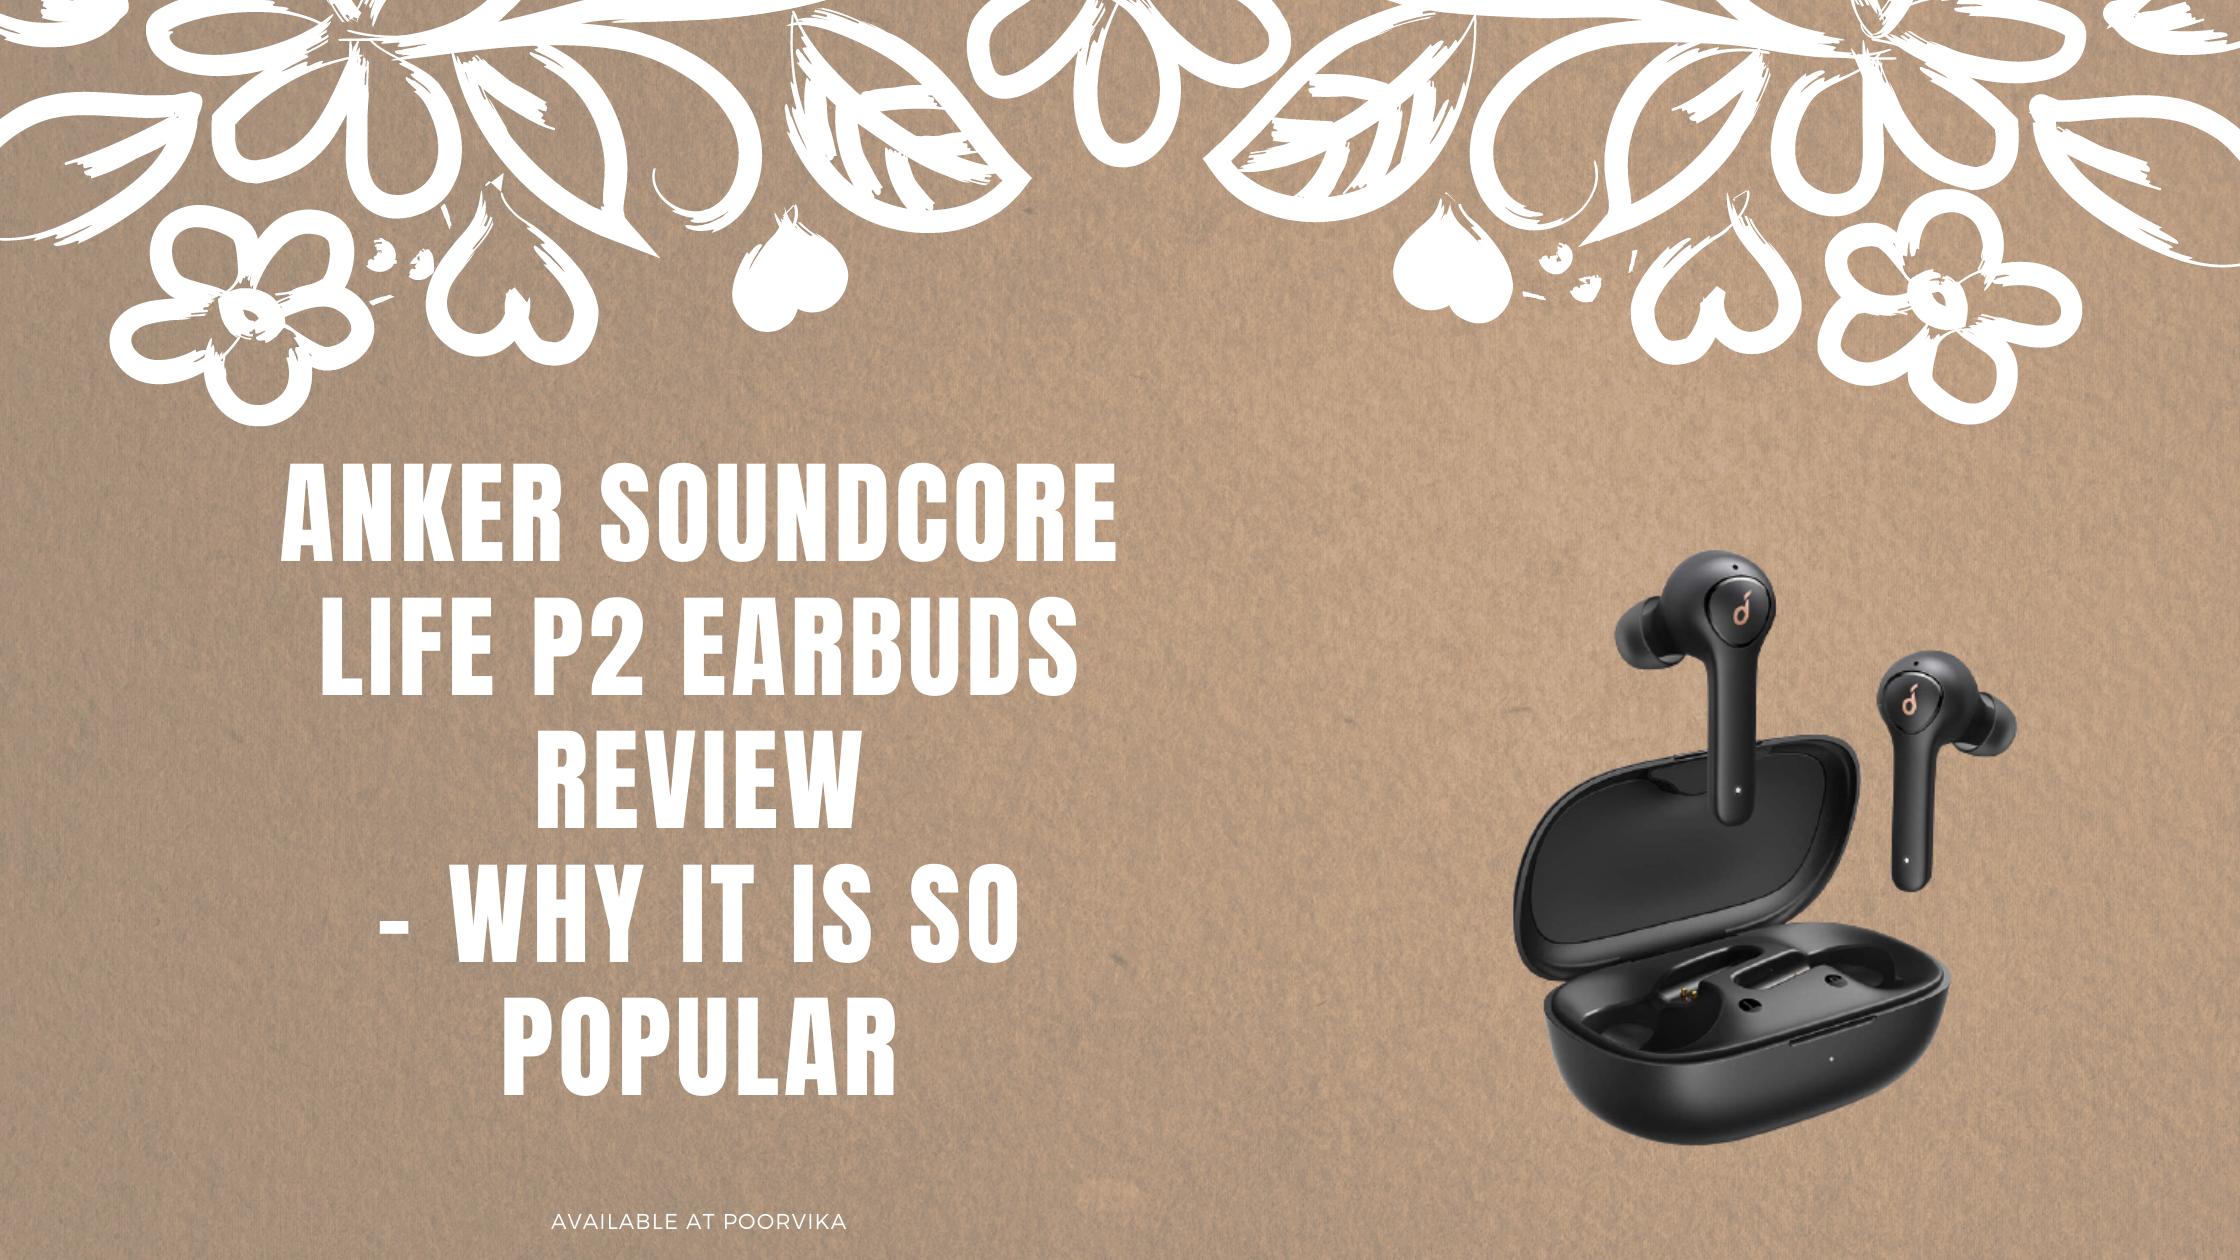 Anker-Soundcore-P2